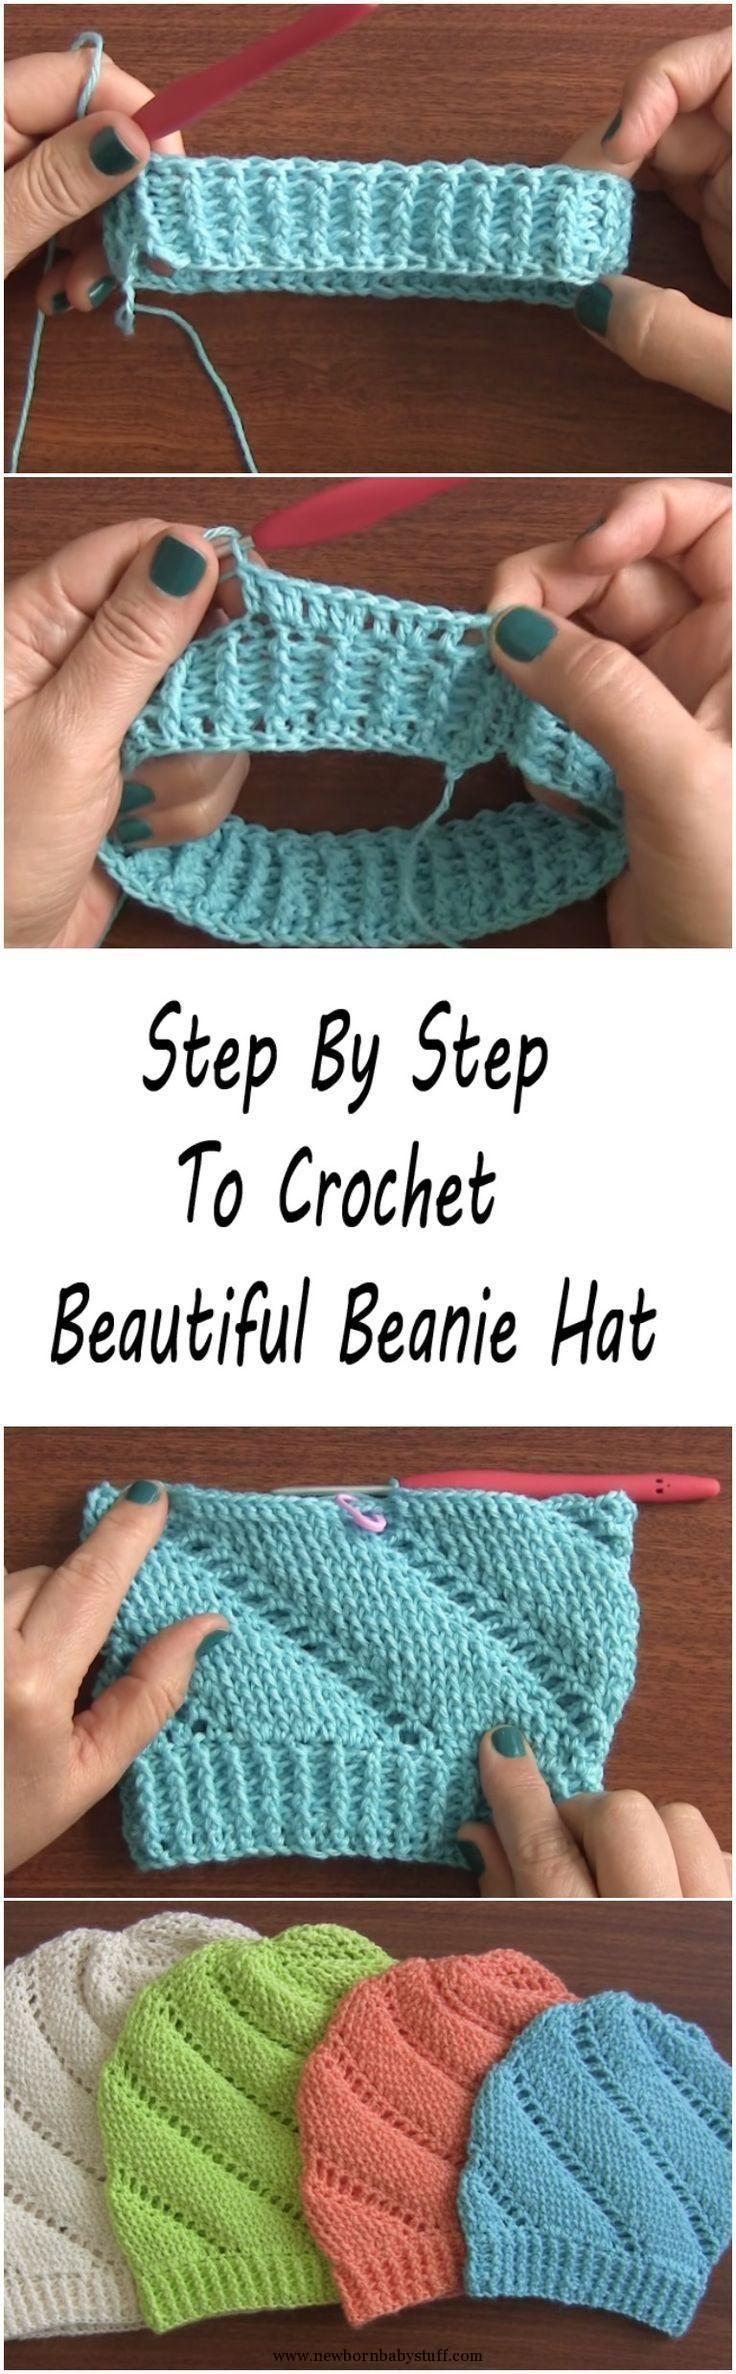 Baby Knitting Patterns Child Knitting Patterns Lovely Beanie Hat ...